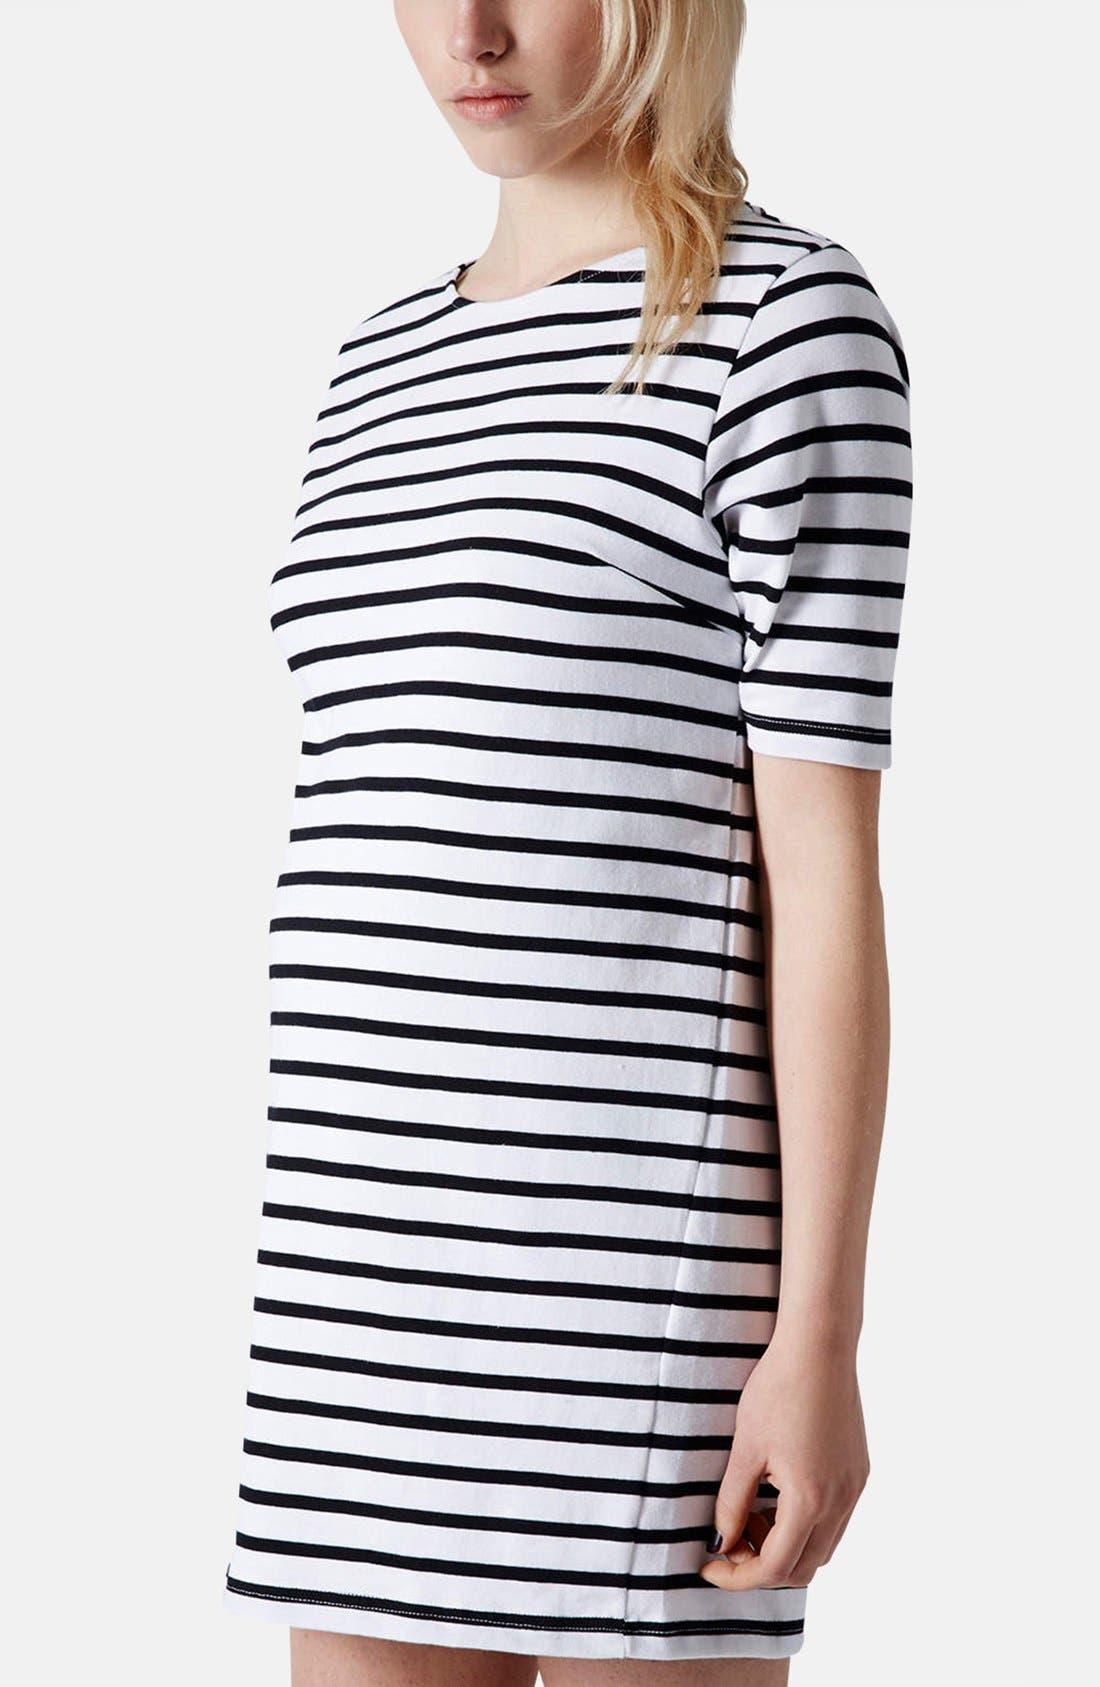 Alternate Image 1 Selected - Topshop Stripe Cotton Maternity Tunic Dress